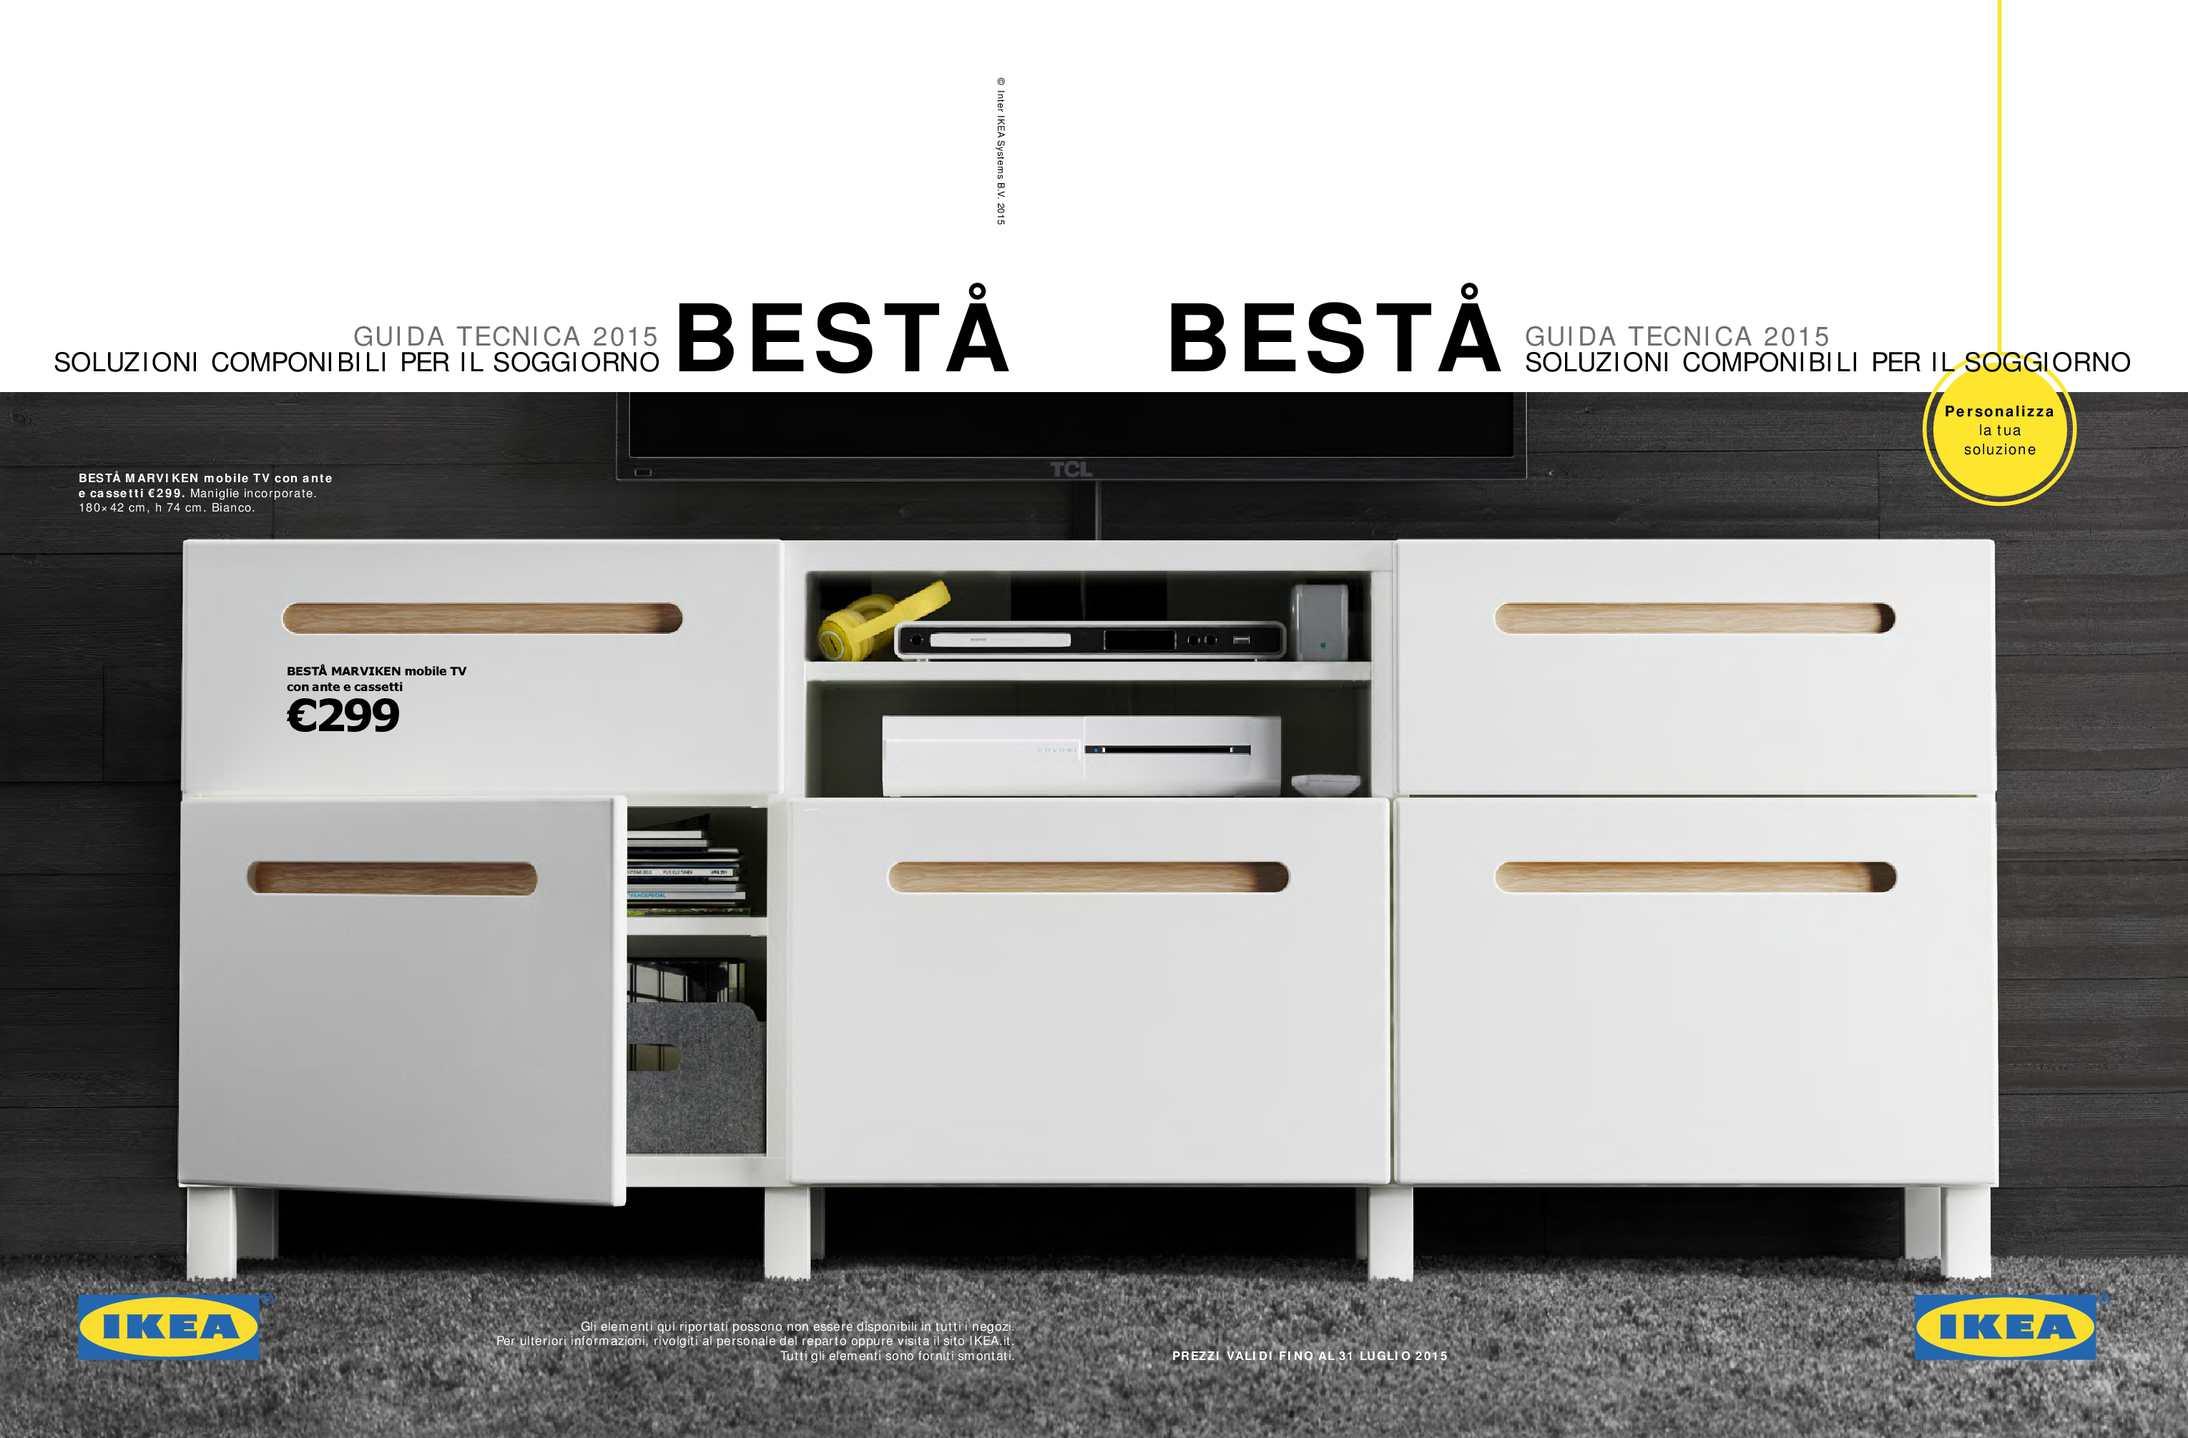 Gambe Per Mobili Ikea calaméo - ikea guida besta 2015